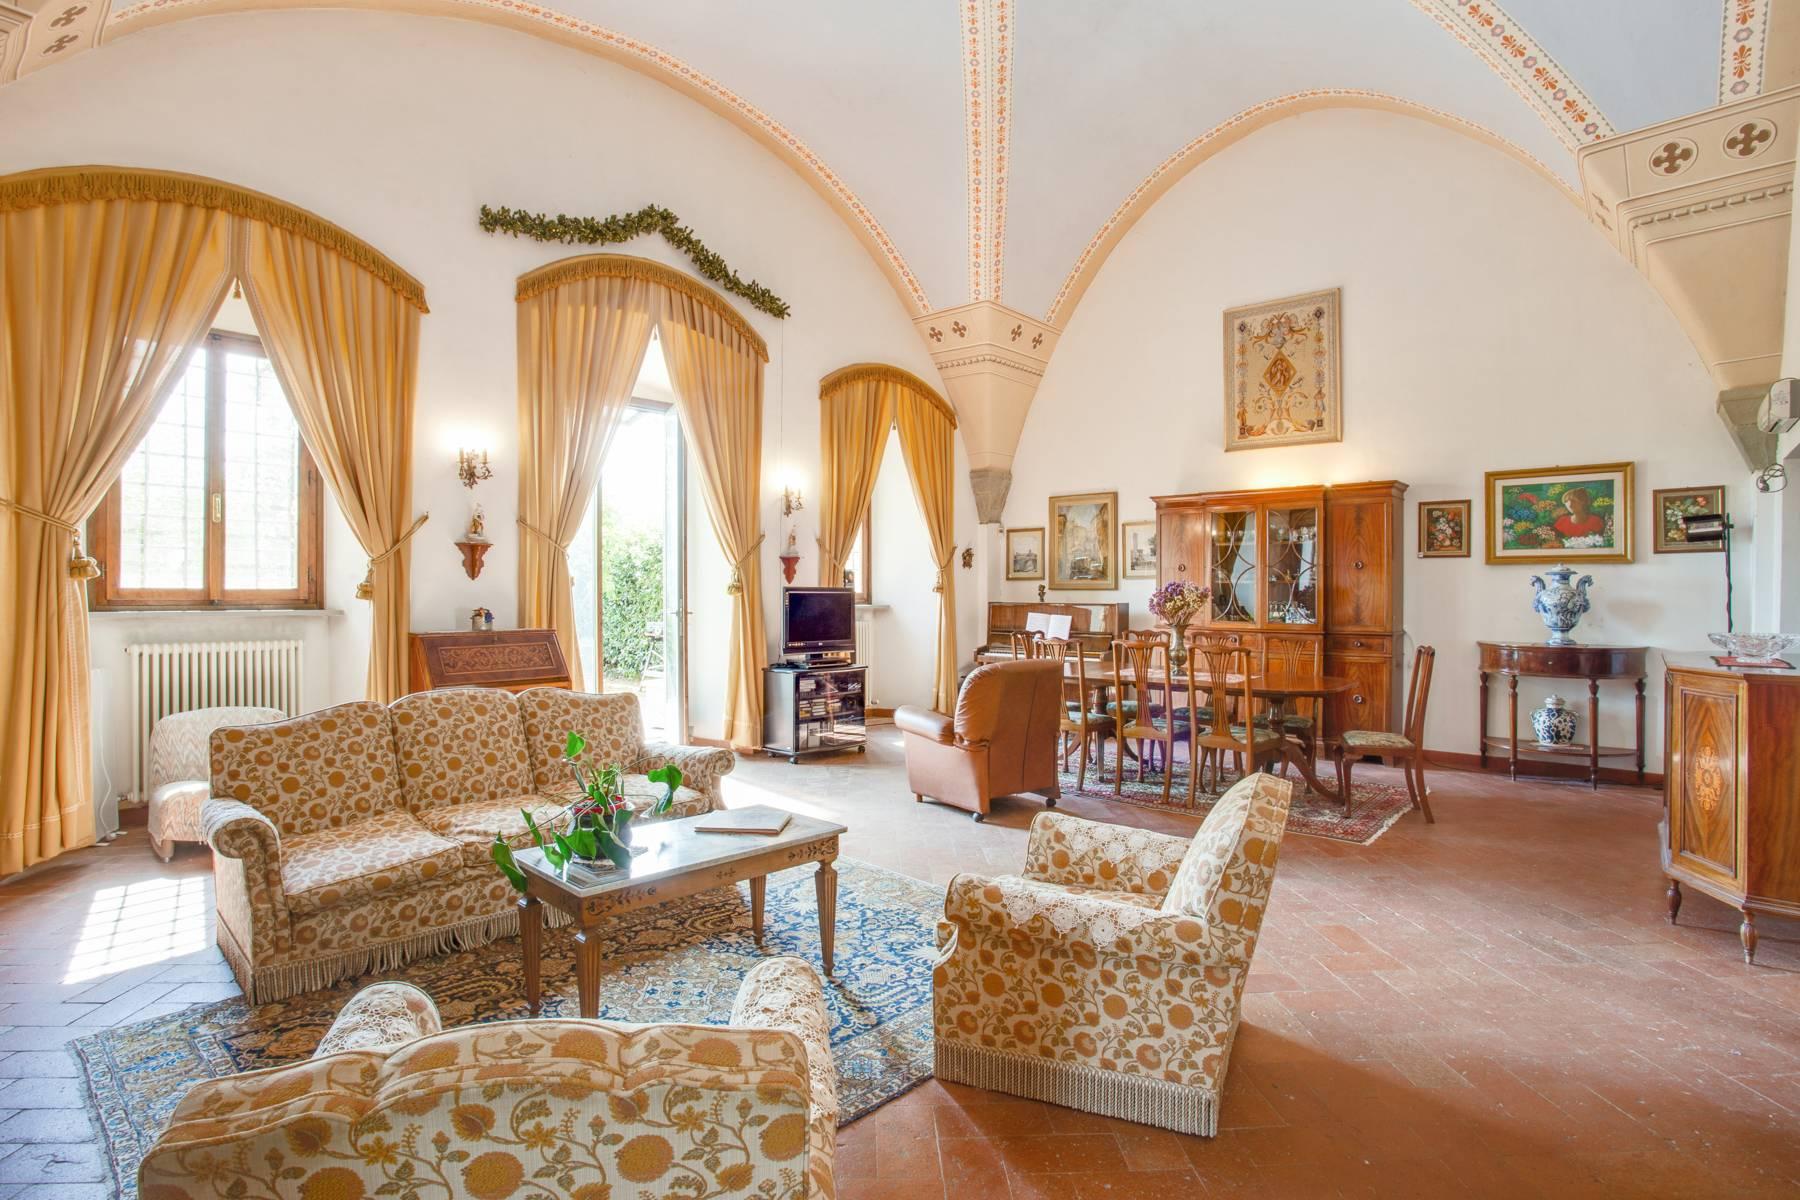 Appartamento in Vendita a Scandicci: 5 locali, 140 mq - Foto 2